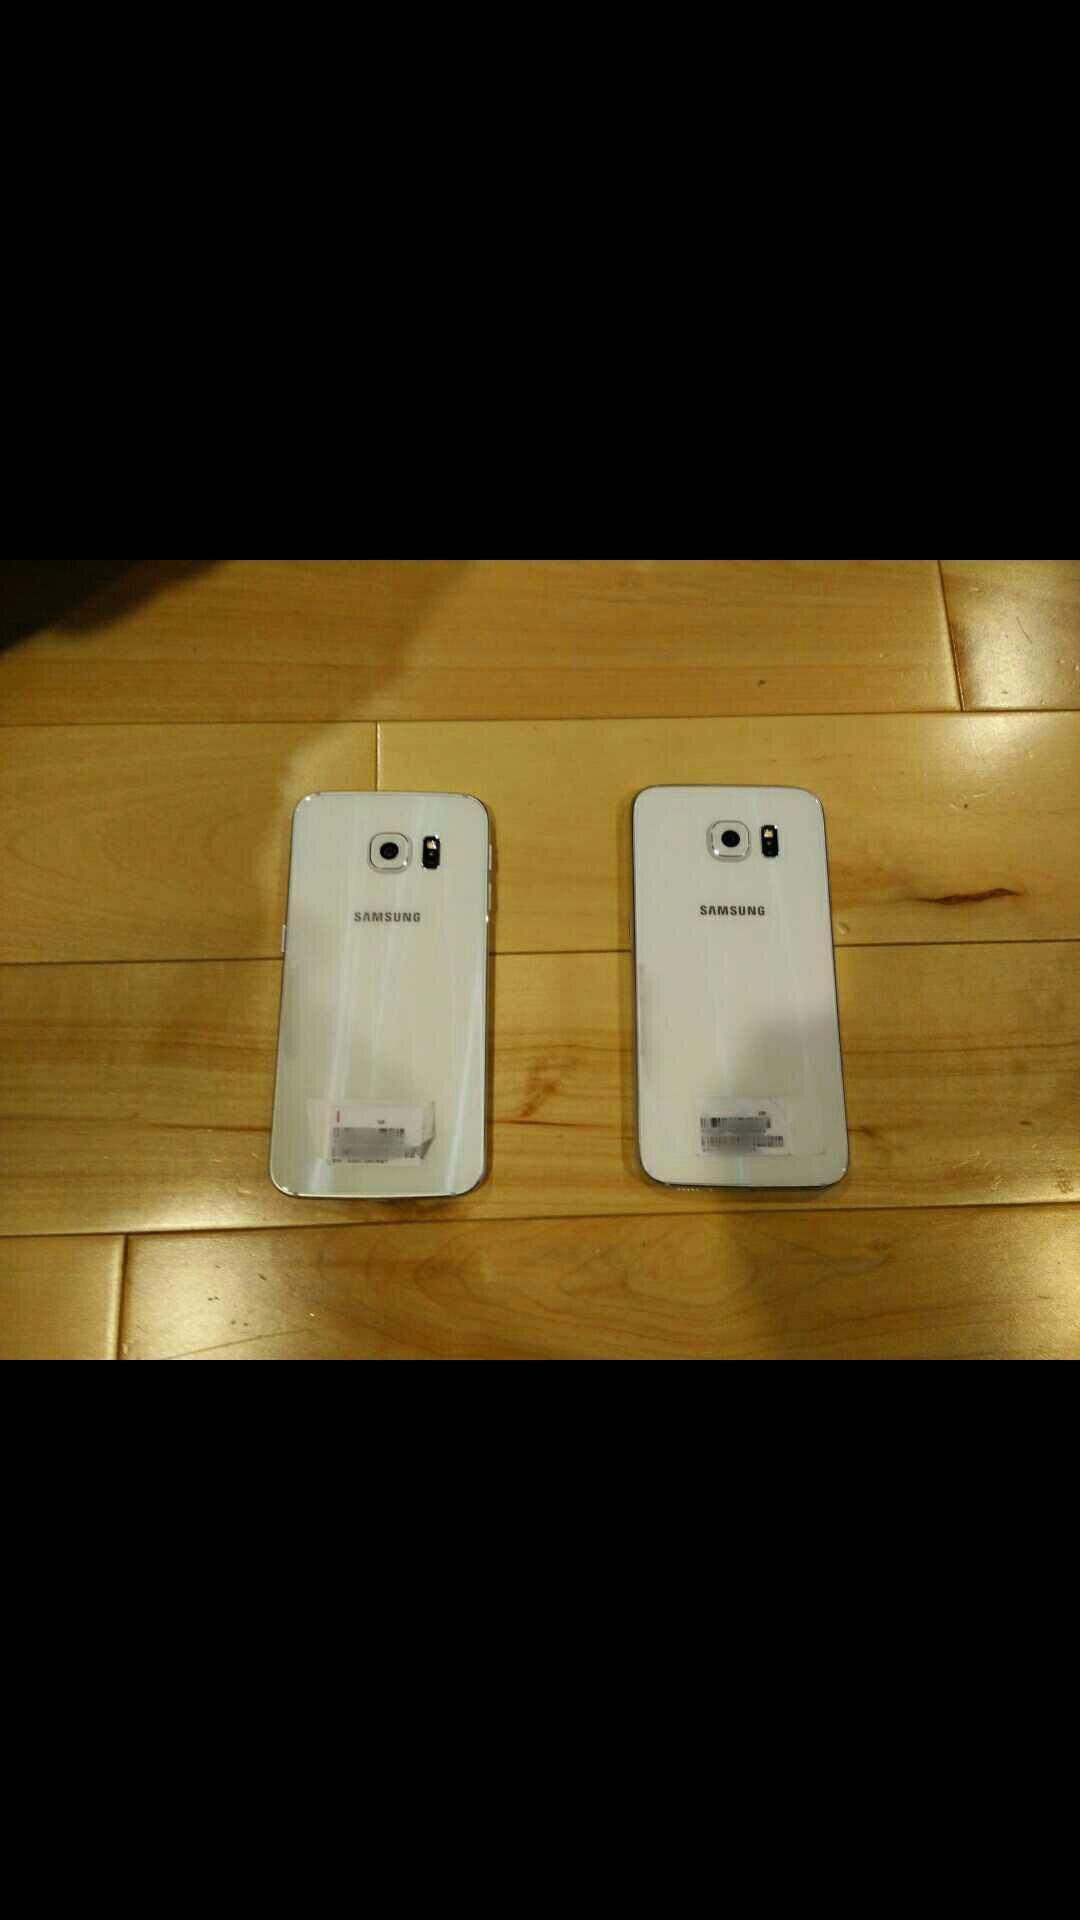 Samsung_Galaxy_S6_ATT_Leak-12